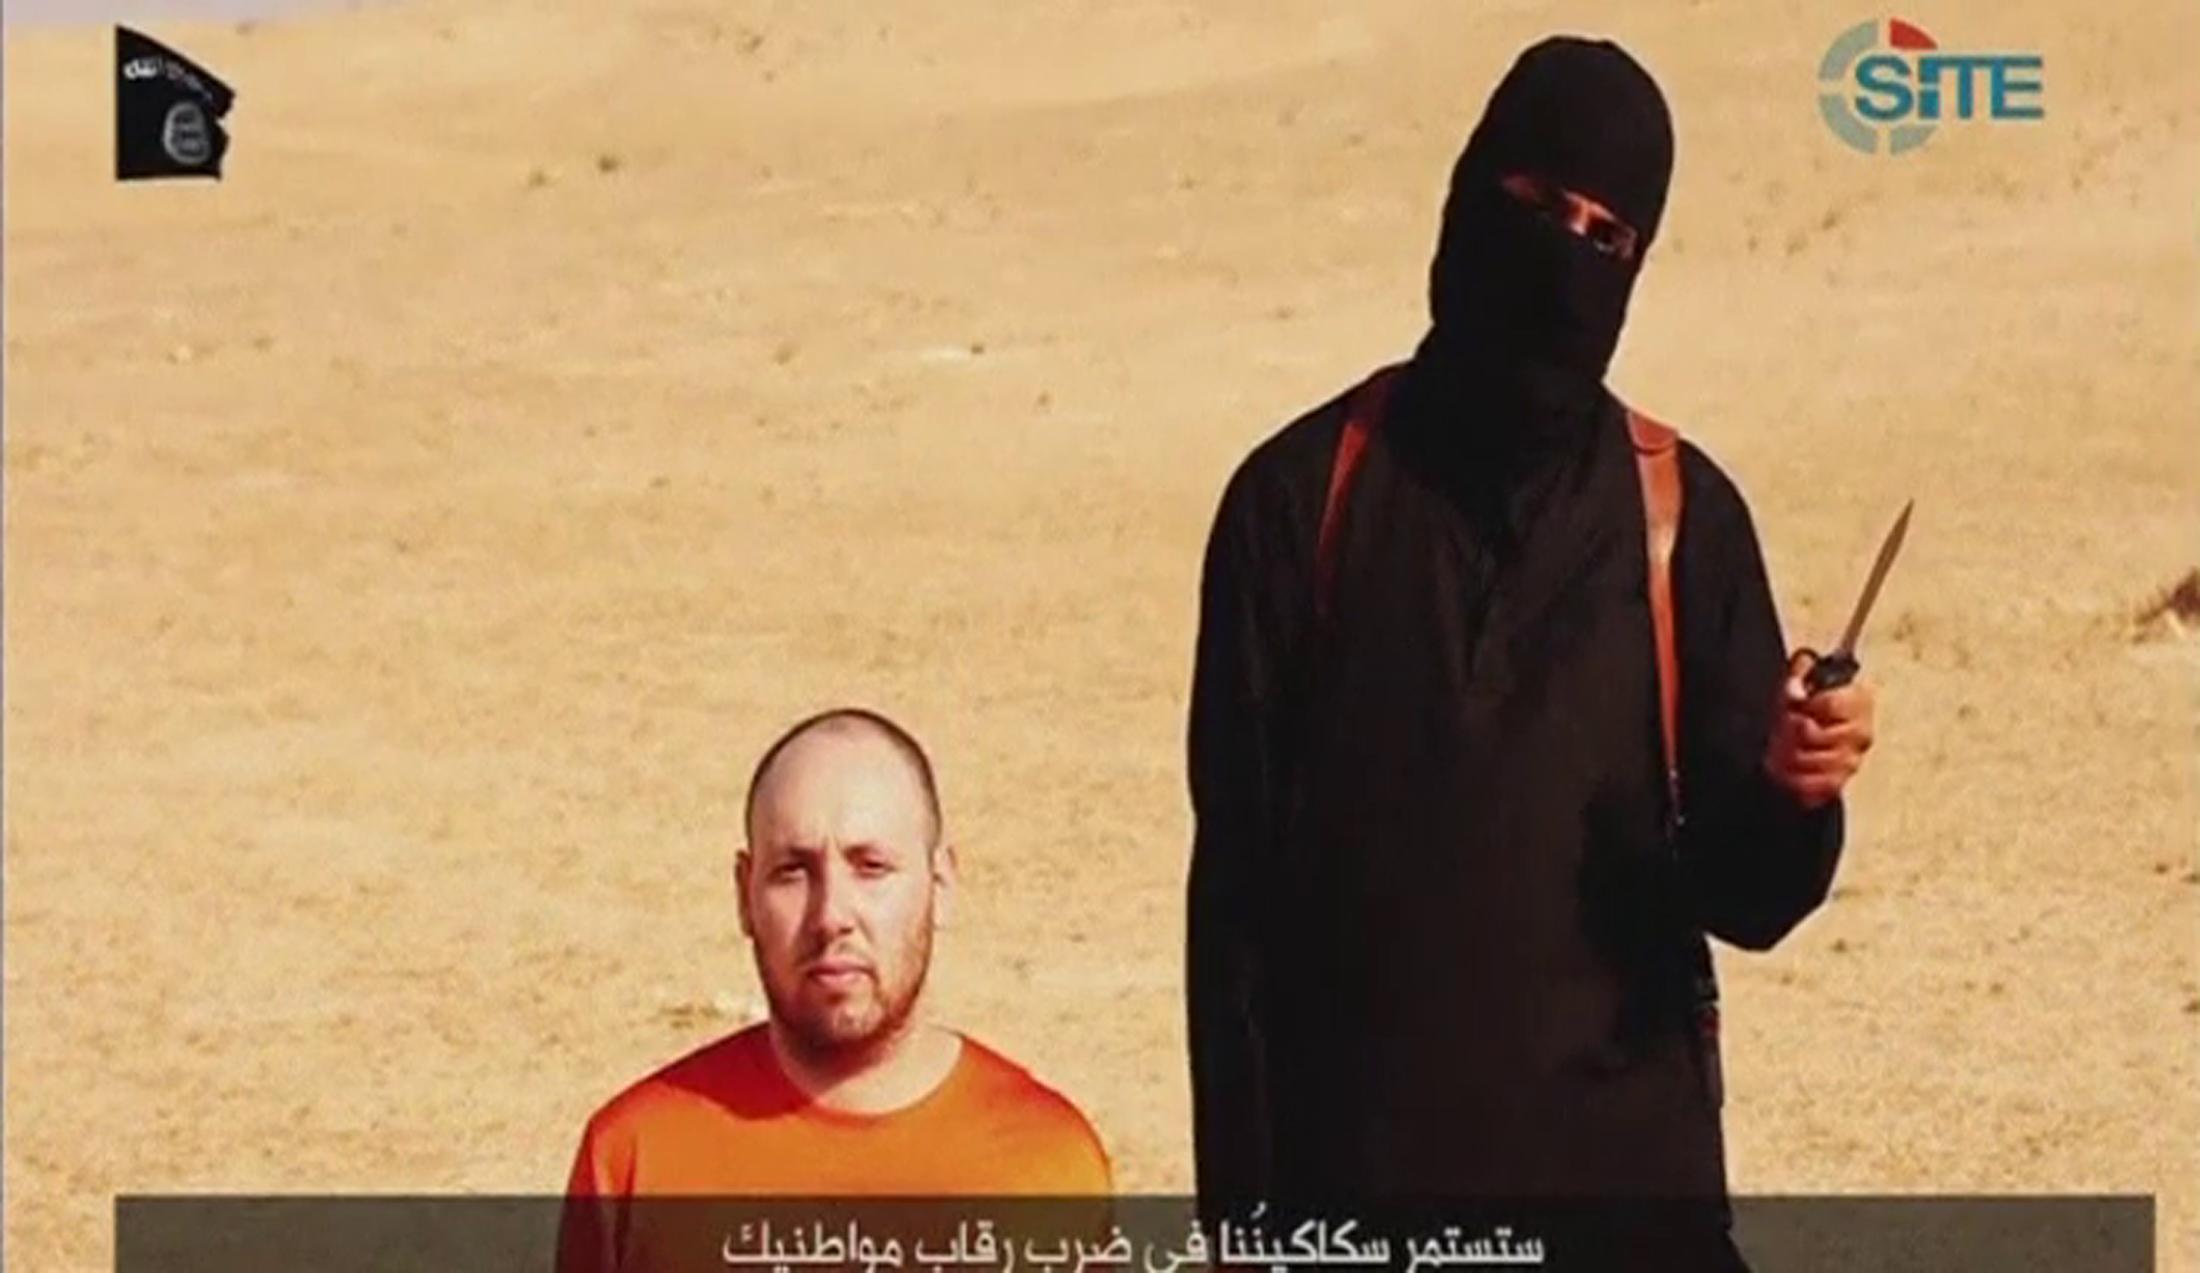 Image for Исламское государство — угроза безопасности Эстонии